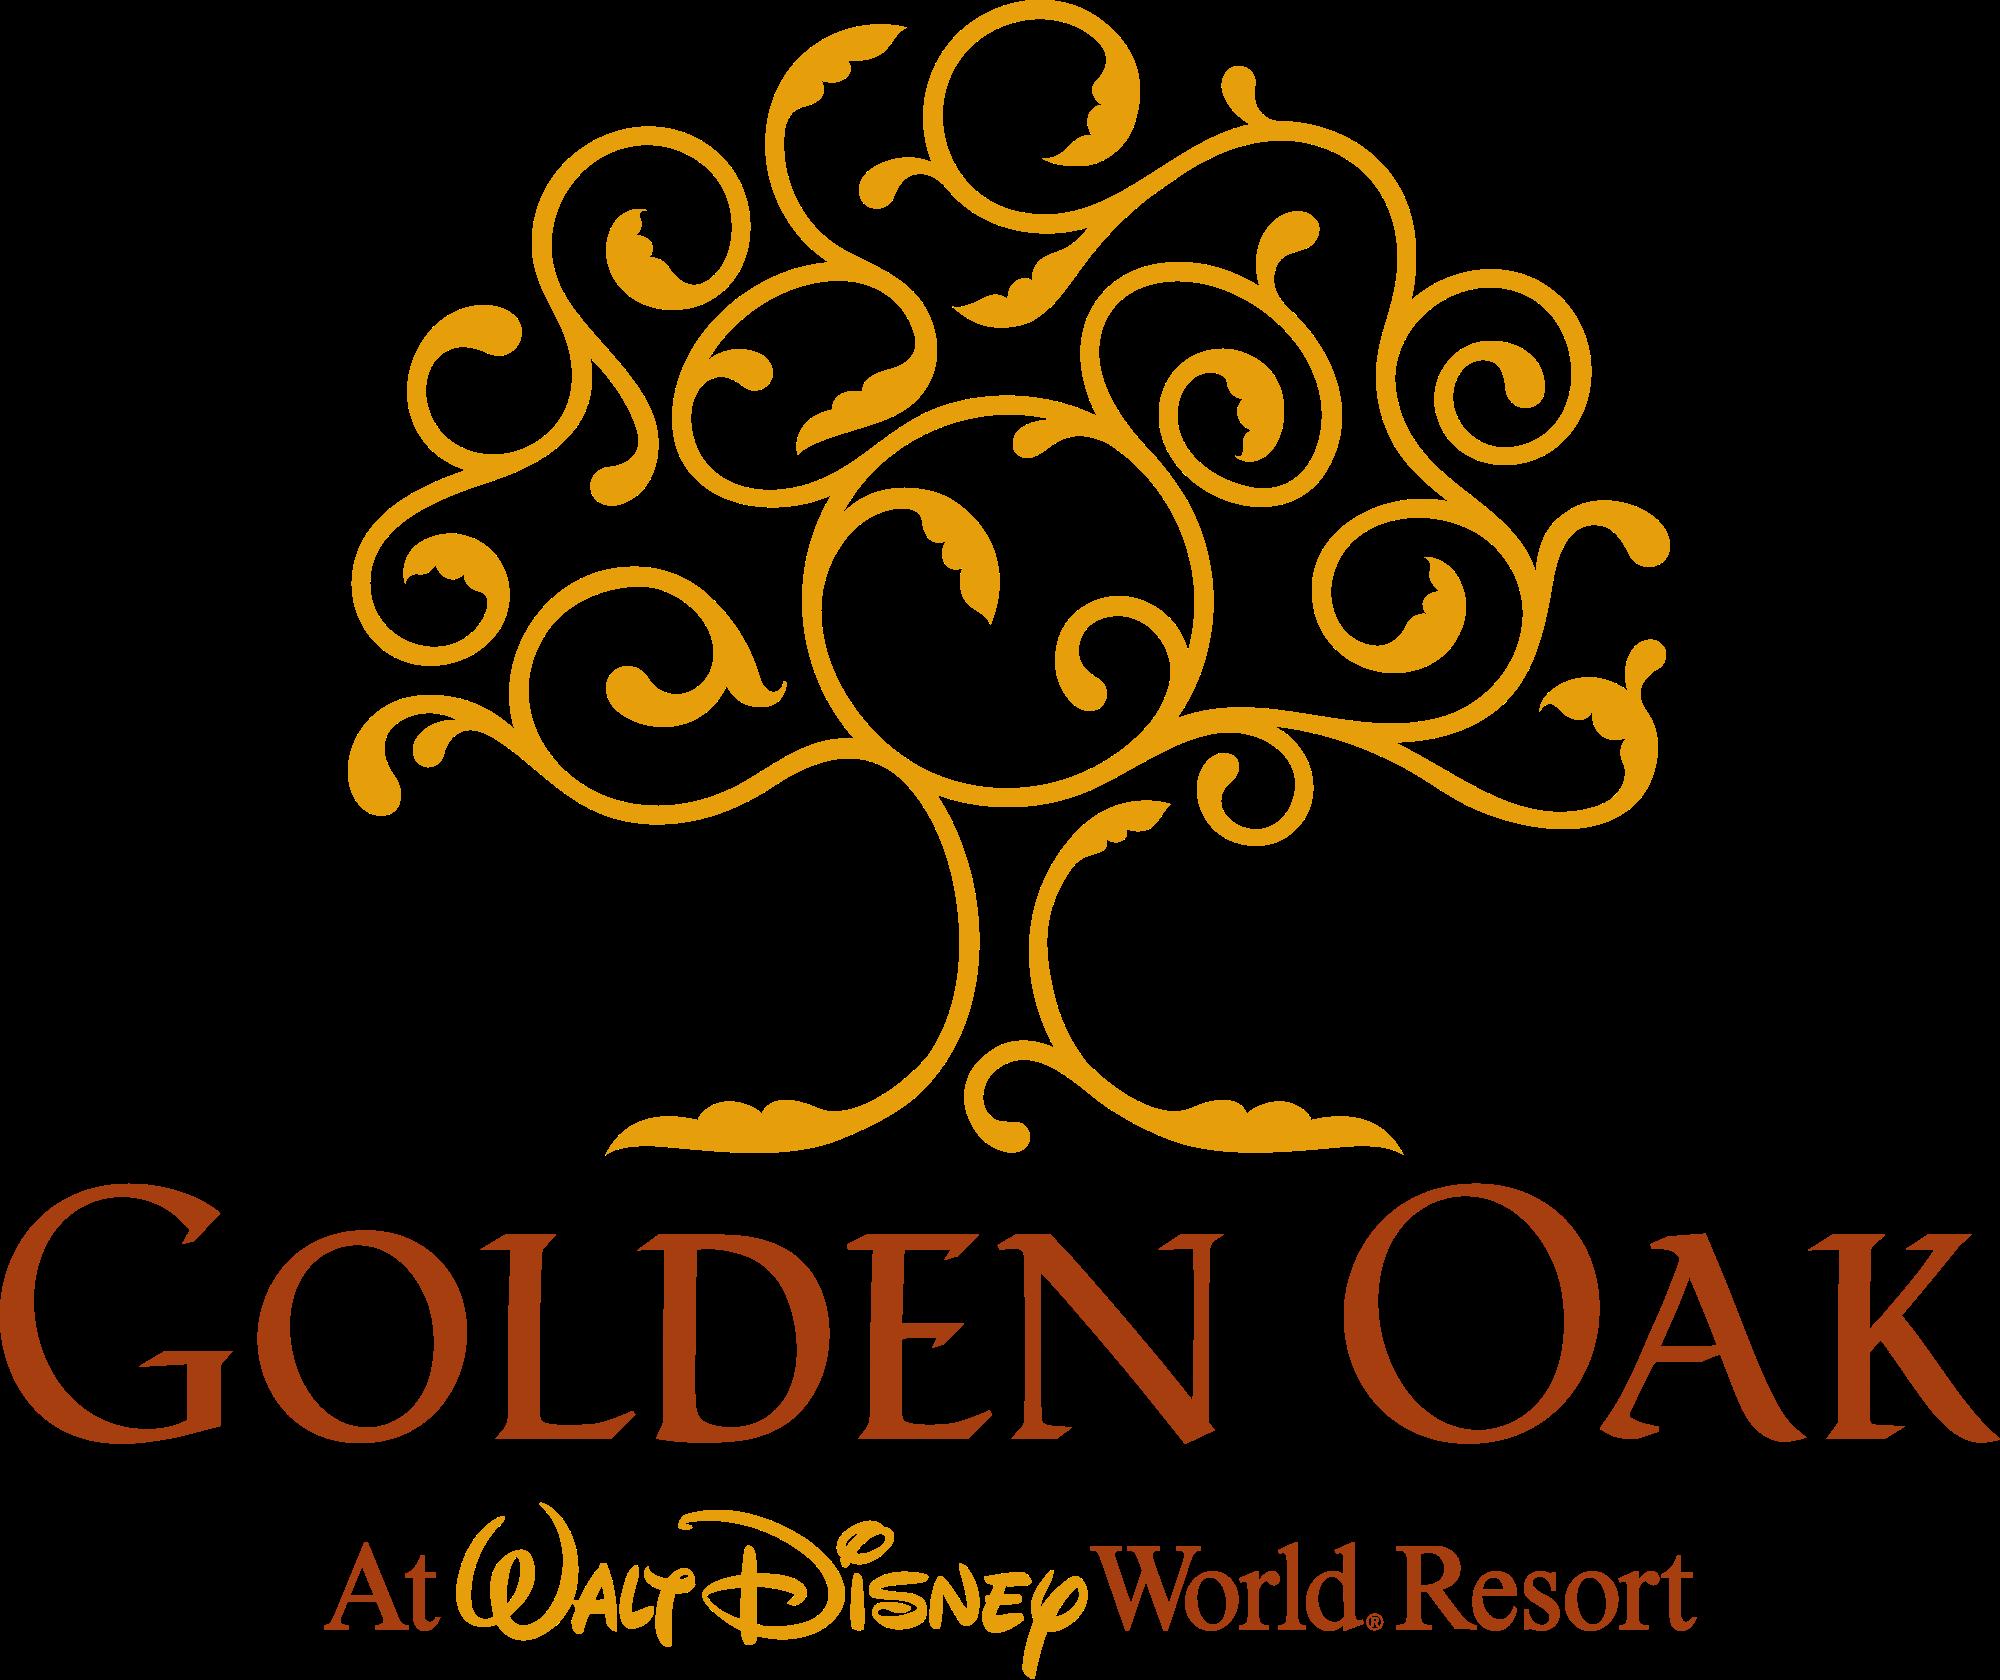 Golden Oak at Walt Disney World Resort